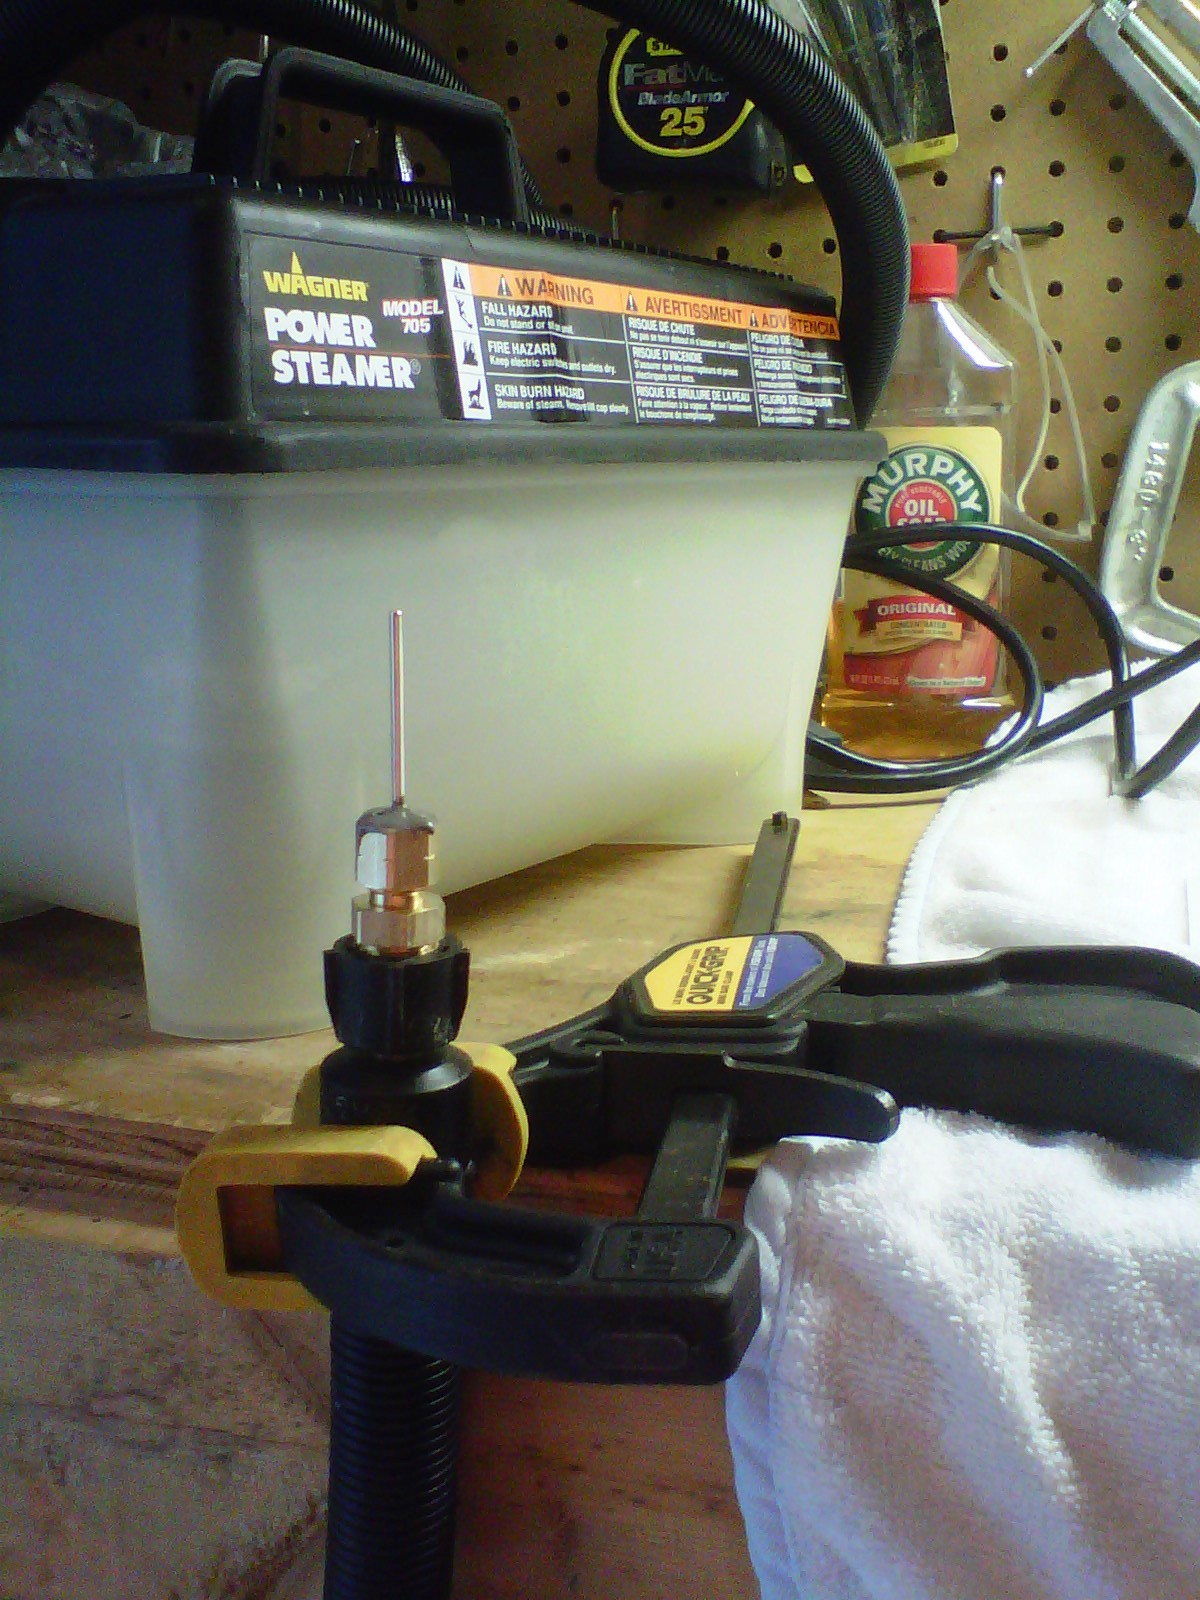 http://2.bp.blogspot.com/-kmCz4QSebgo/ThH2kUBQSMI/AAAAAAAAAFM/lzfmC9EJmww/s1600/Wagner_705_steam_machine_03.jpg